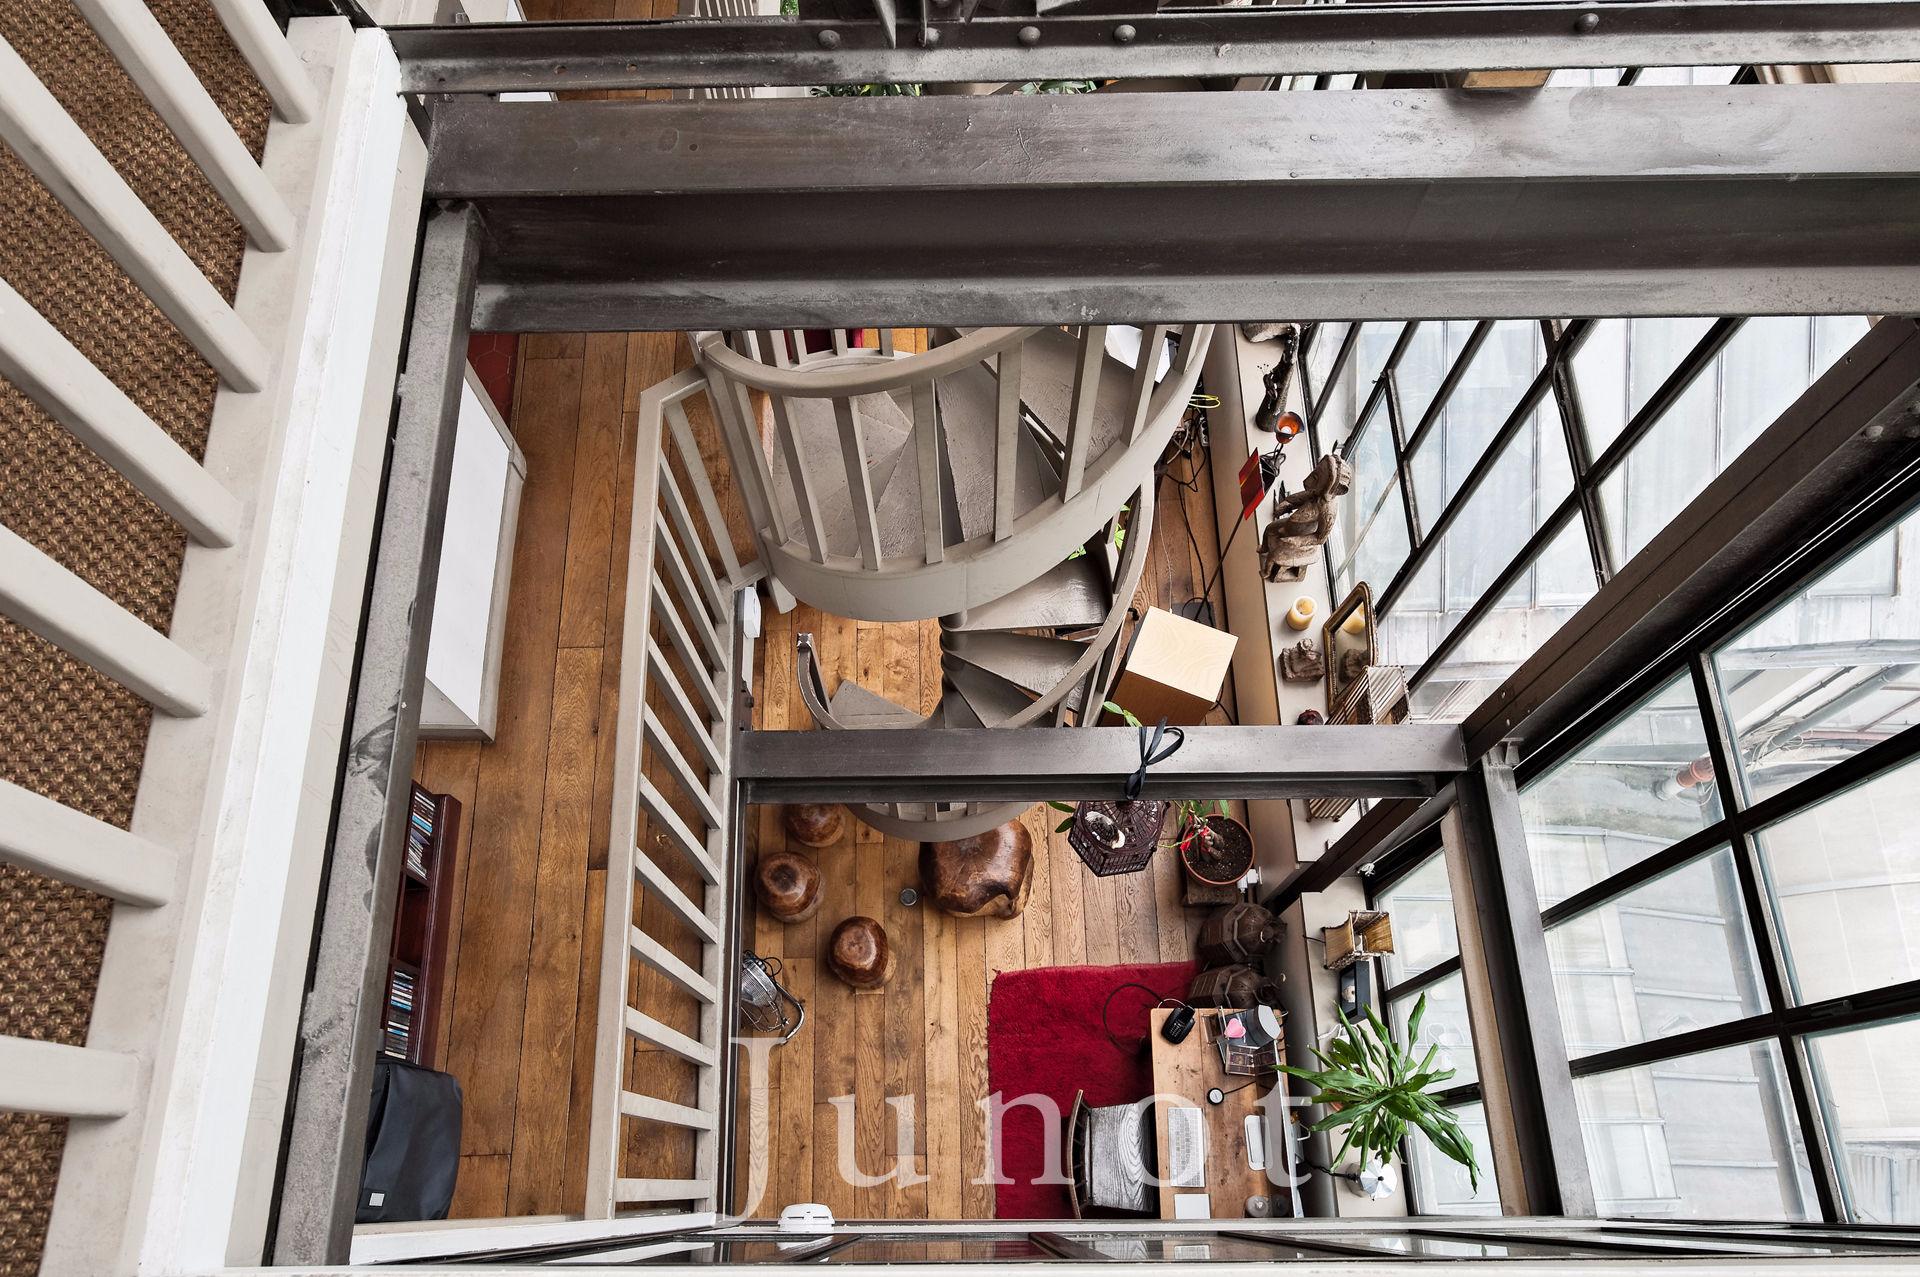 paris 18 me junot. Black Bedroom Furniture Sets. Home Design Ideas